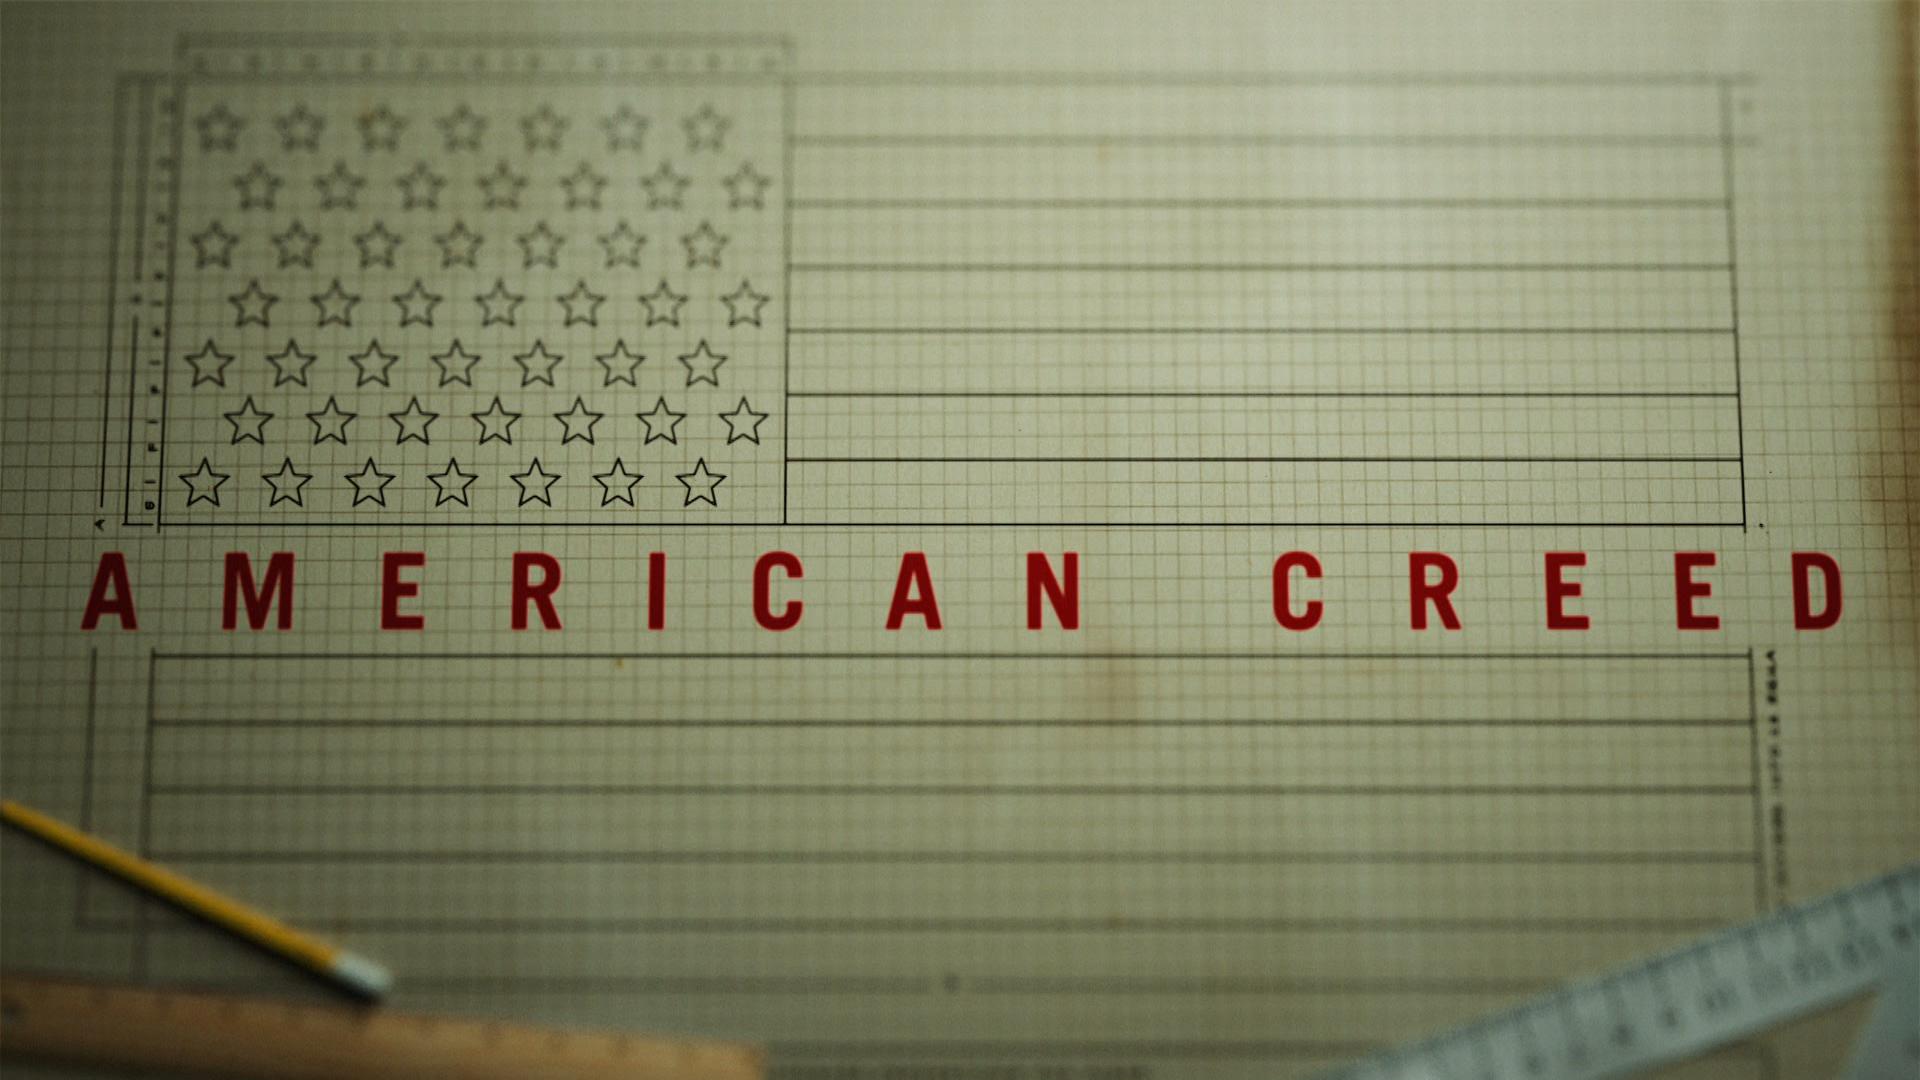 American Creed_promo_clean_30.mov.01_00_27_17.Still001.jpg